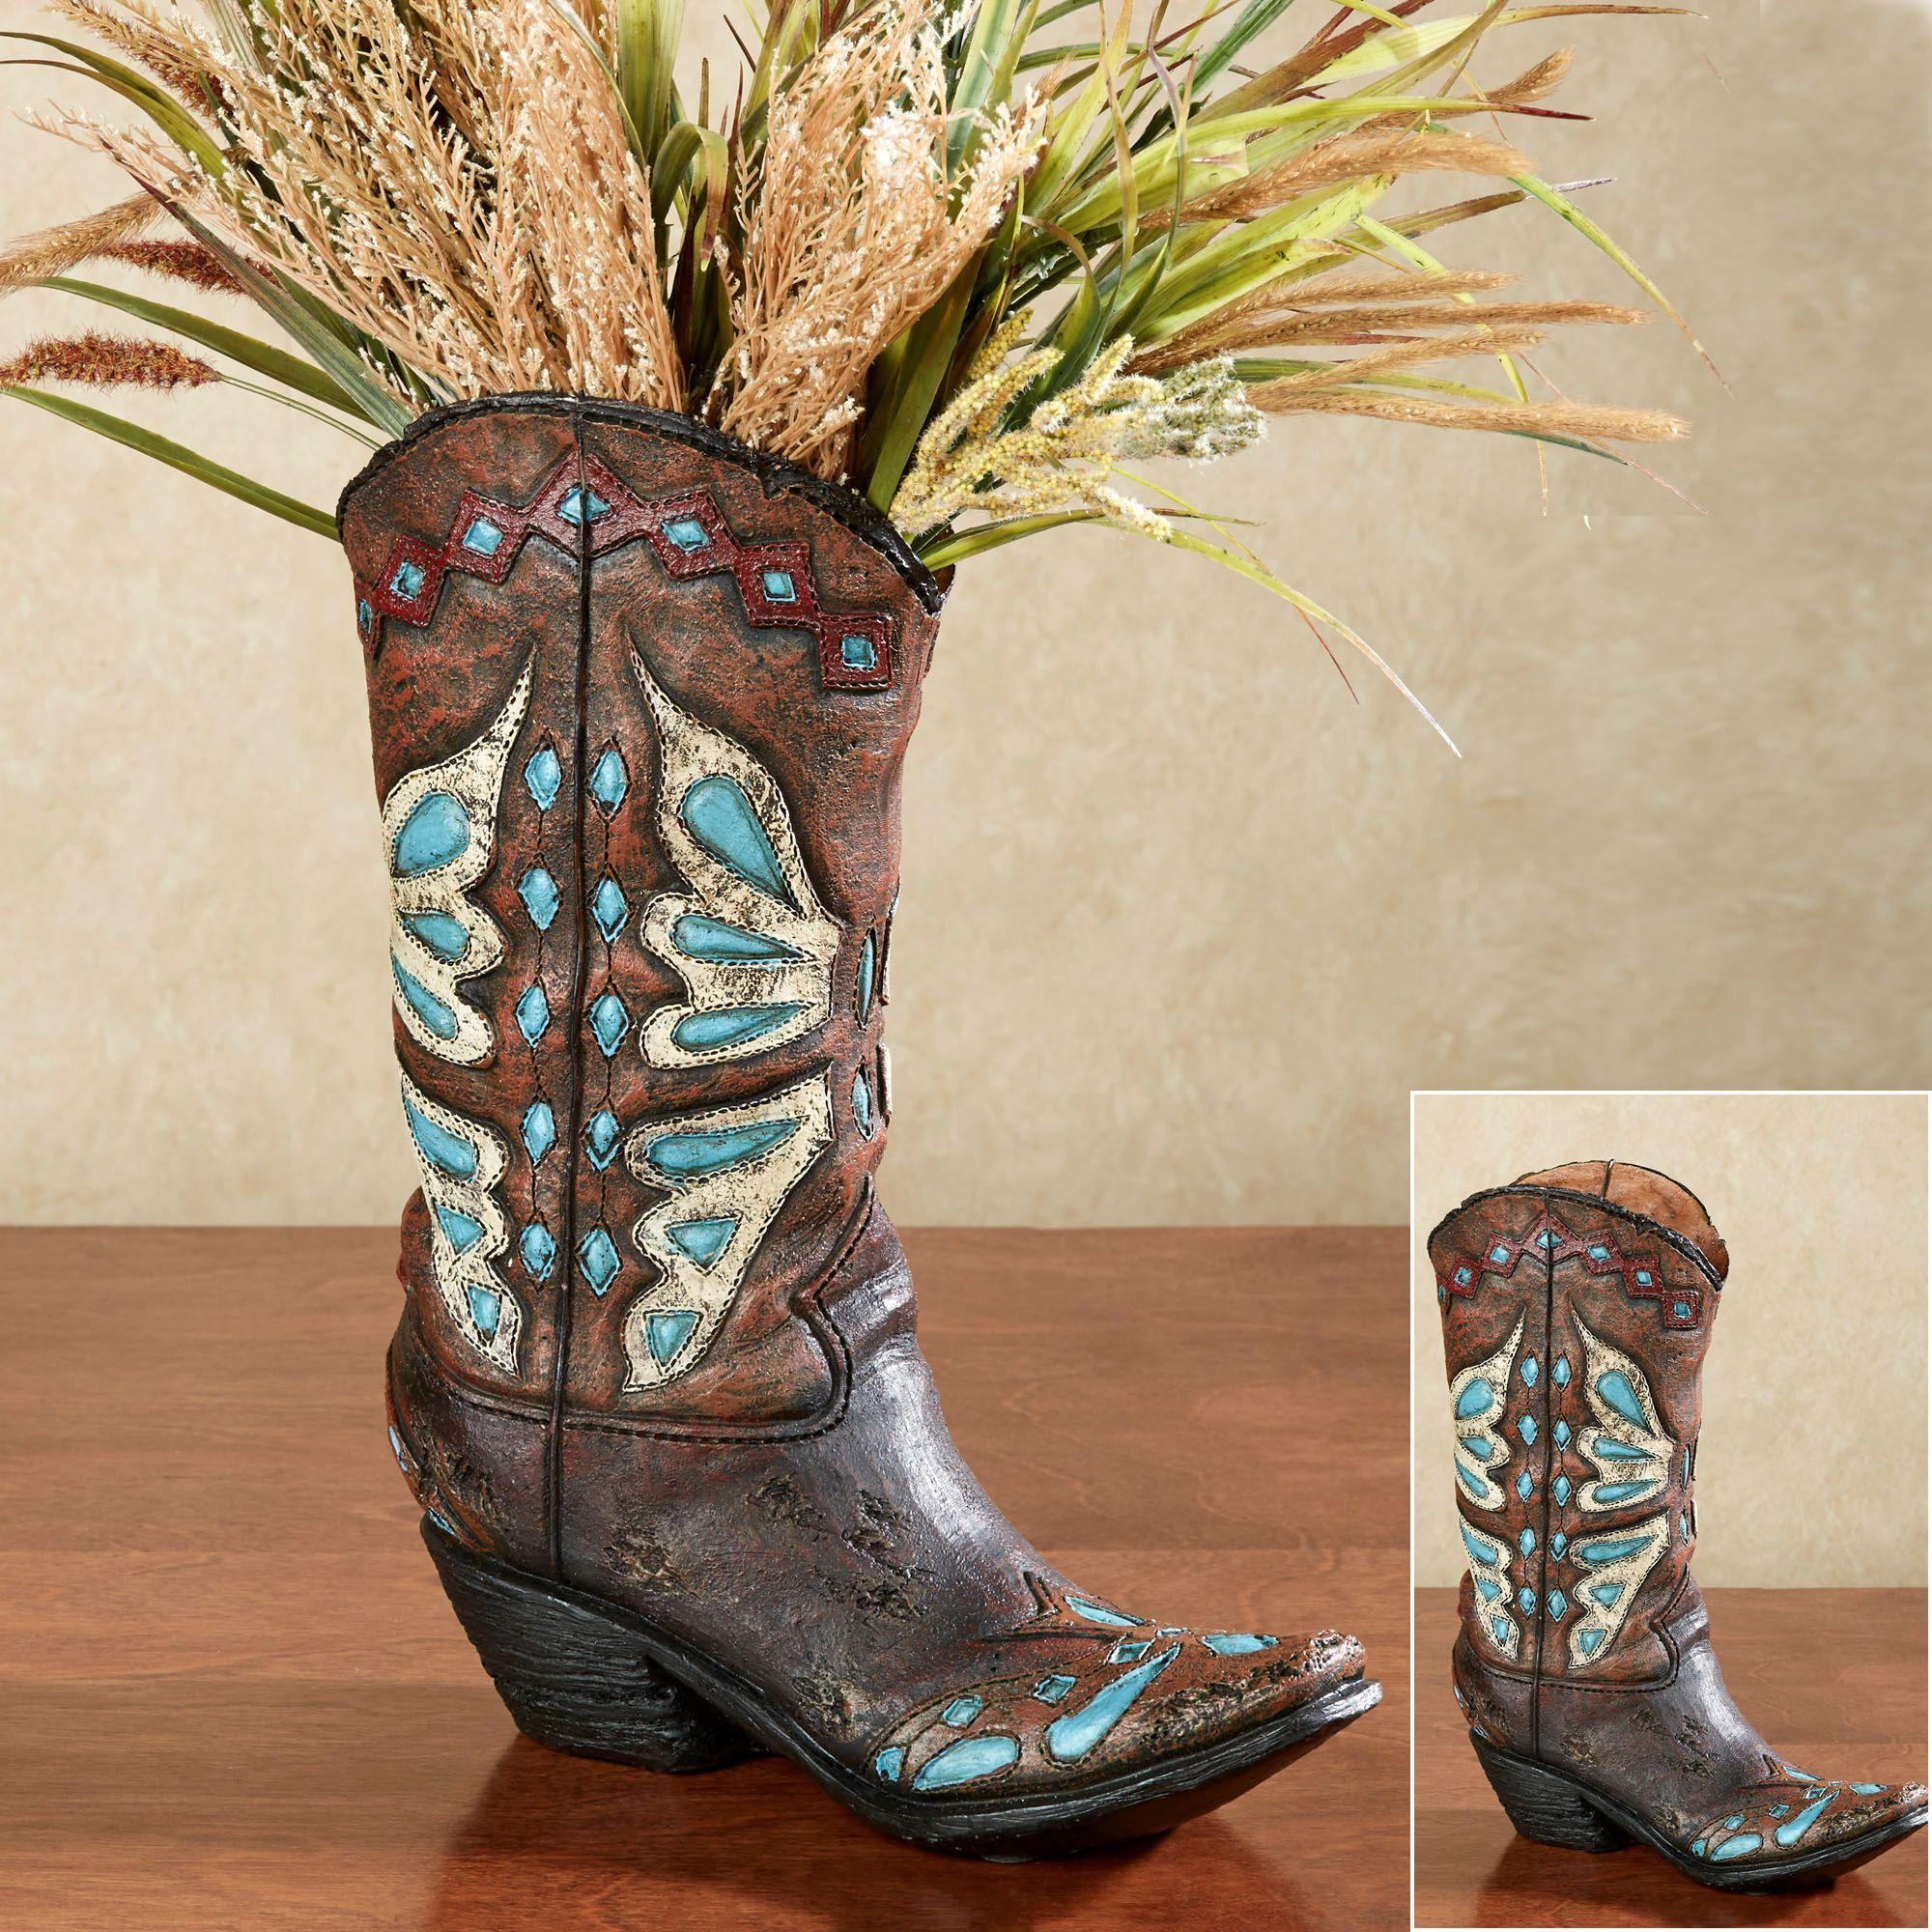 Cowboy boot shaped vase vase turquoise and cowboys cowboy boot shaped vase floridaeventfo Images